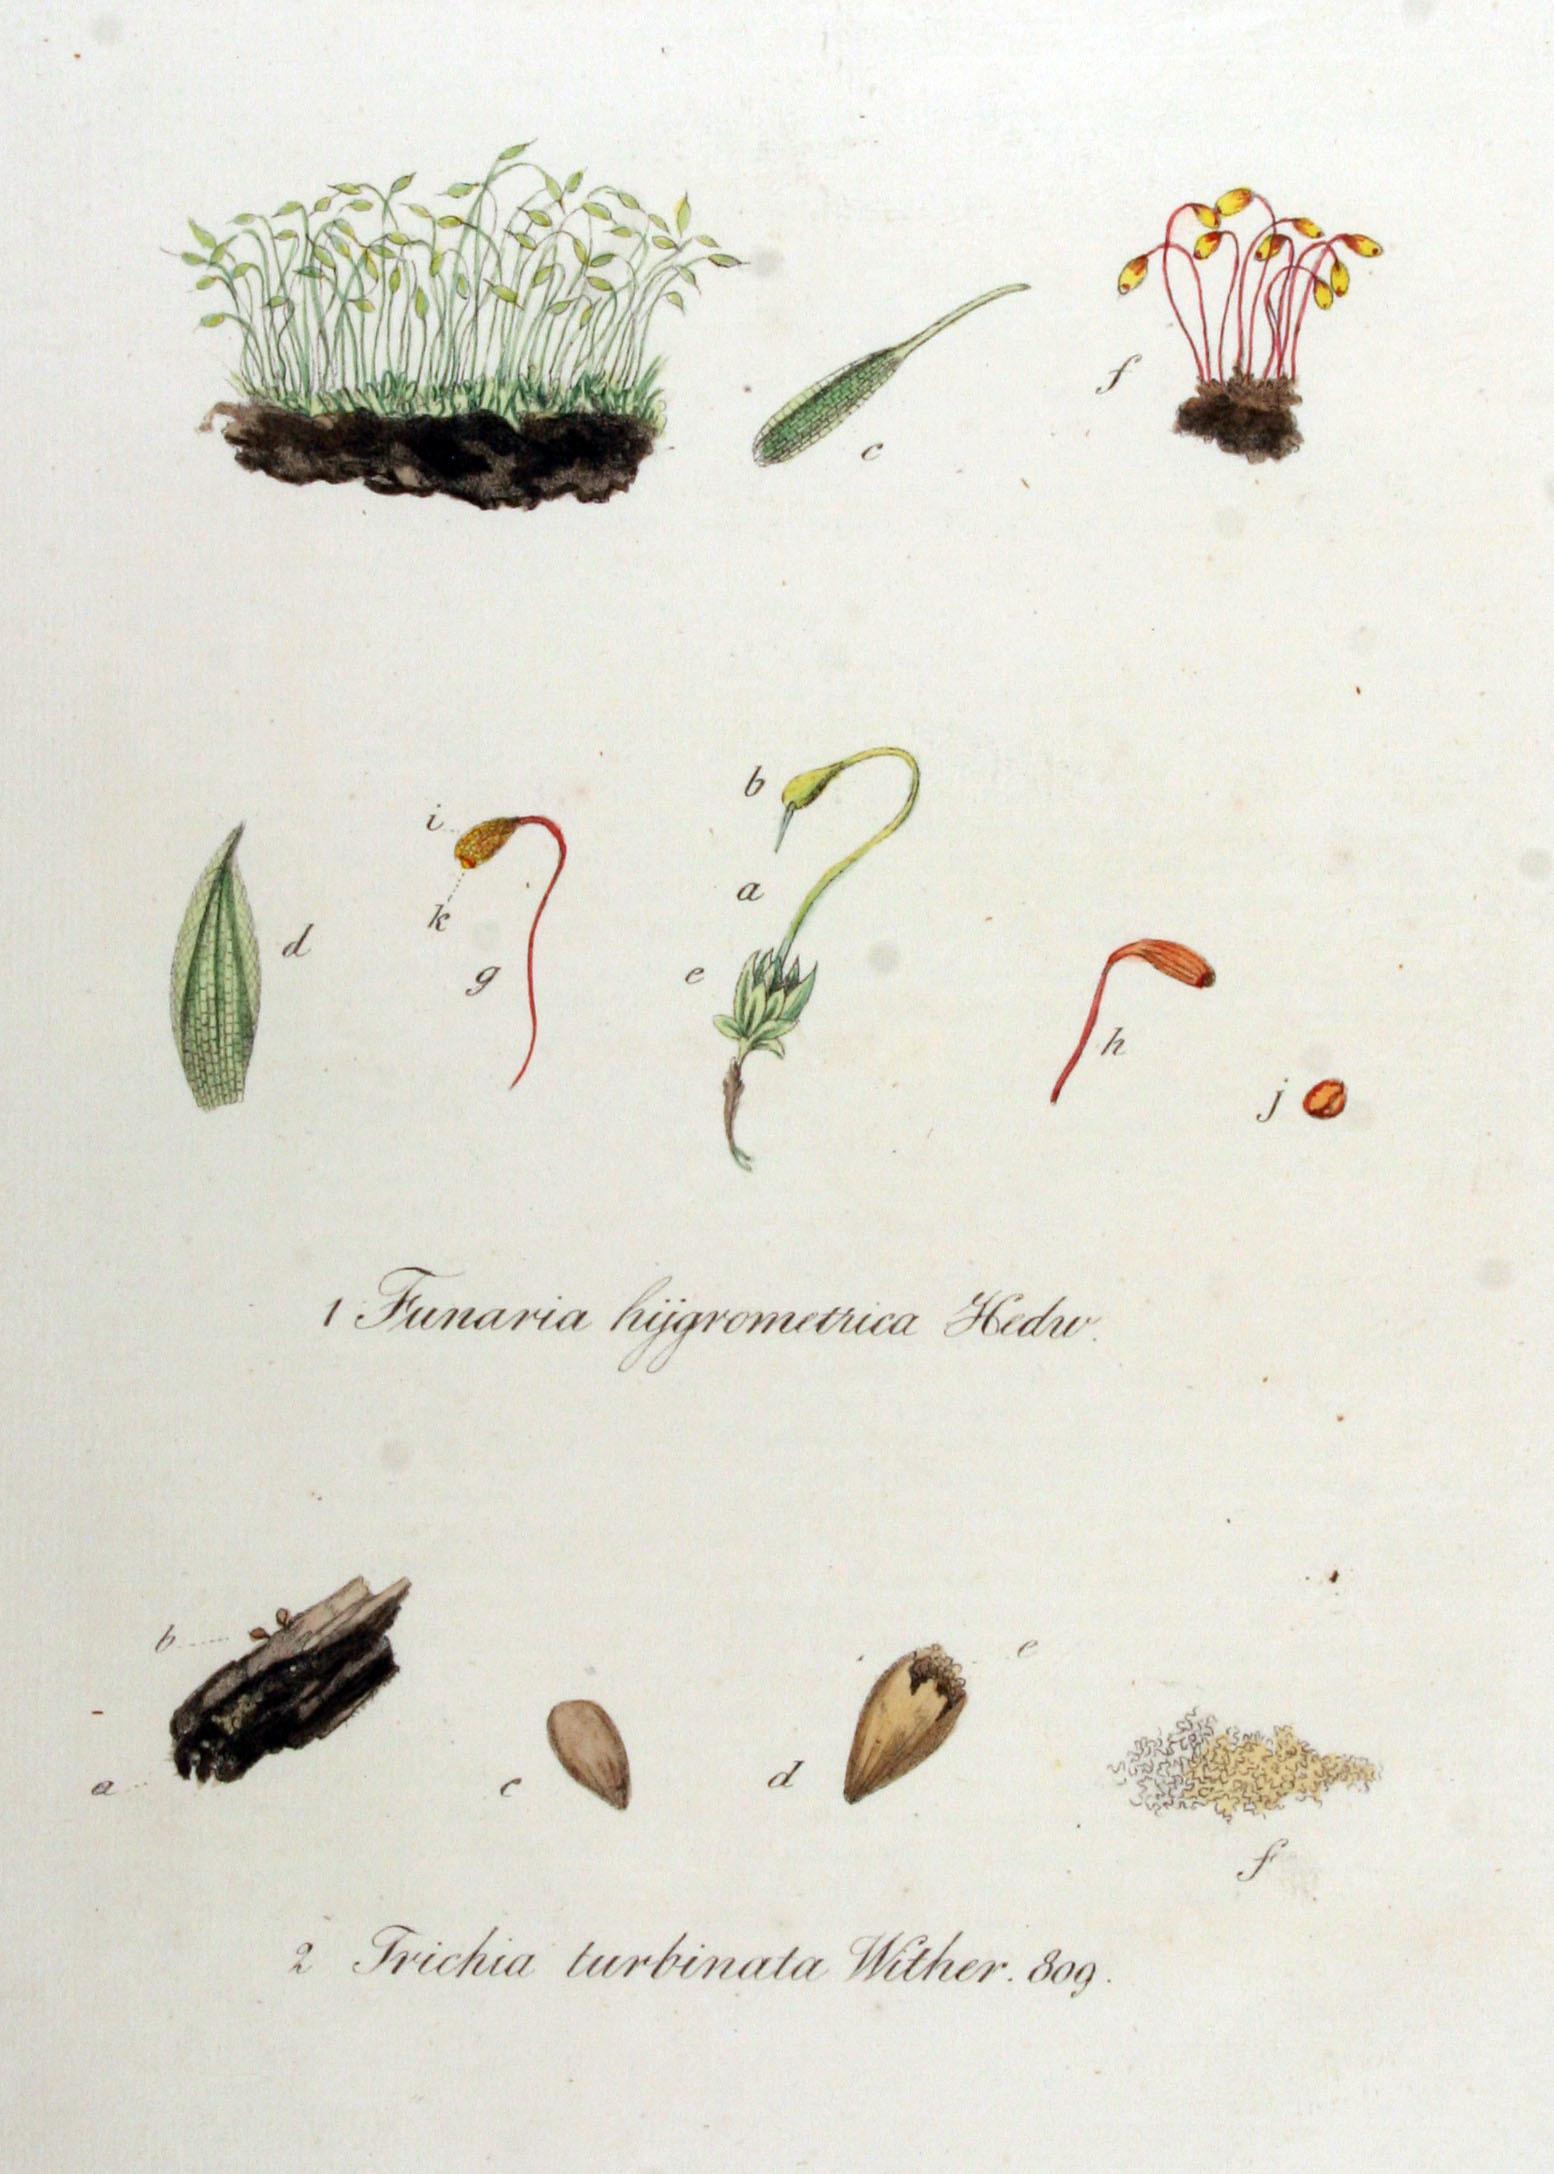 Image of Trichia